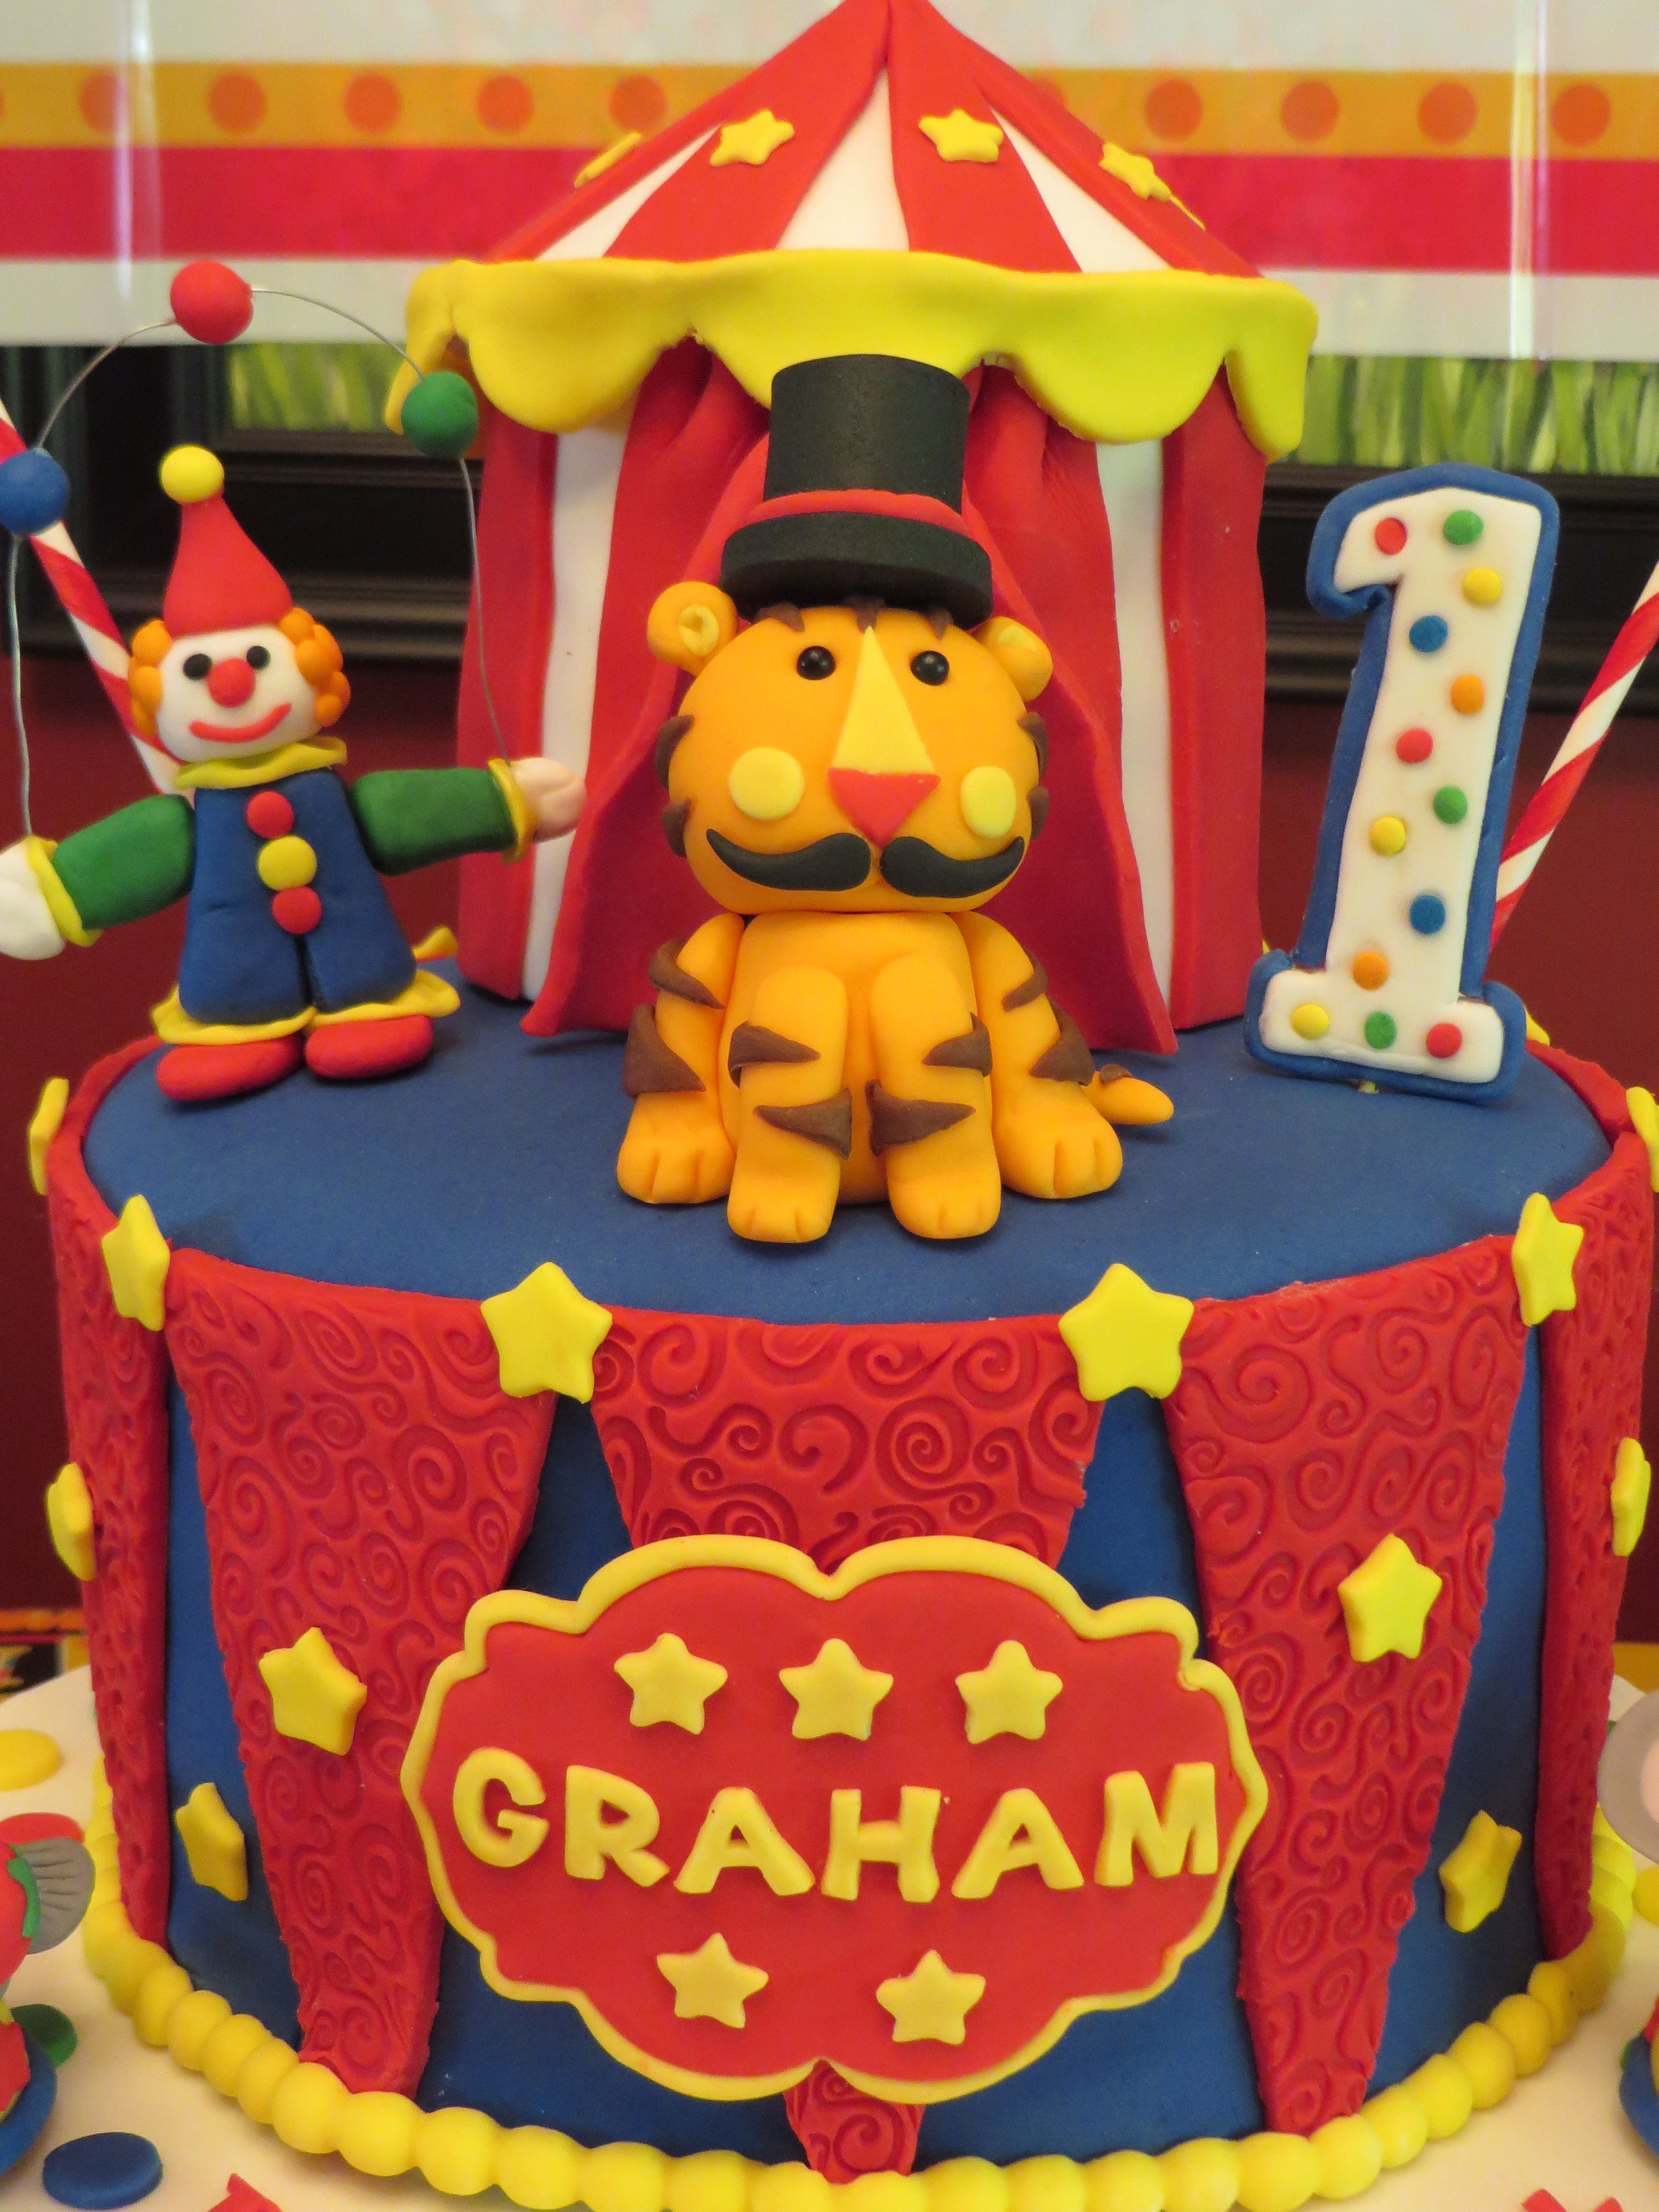 Circus theme cake for my Grandsonu0027s first birthday! 8  Vanilla cake w/vanilla icing and circus tent is 4  chocolate cake w/ vanilla icing. & Circus Theme Cake For My Grandsons First Birthday 8 Vanilla Cake ...